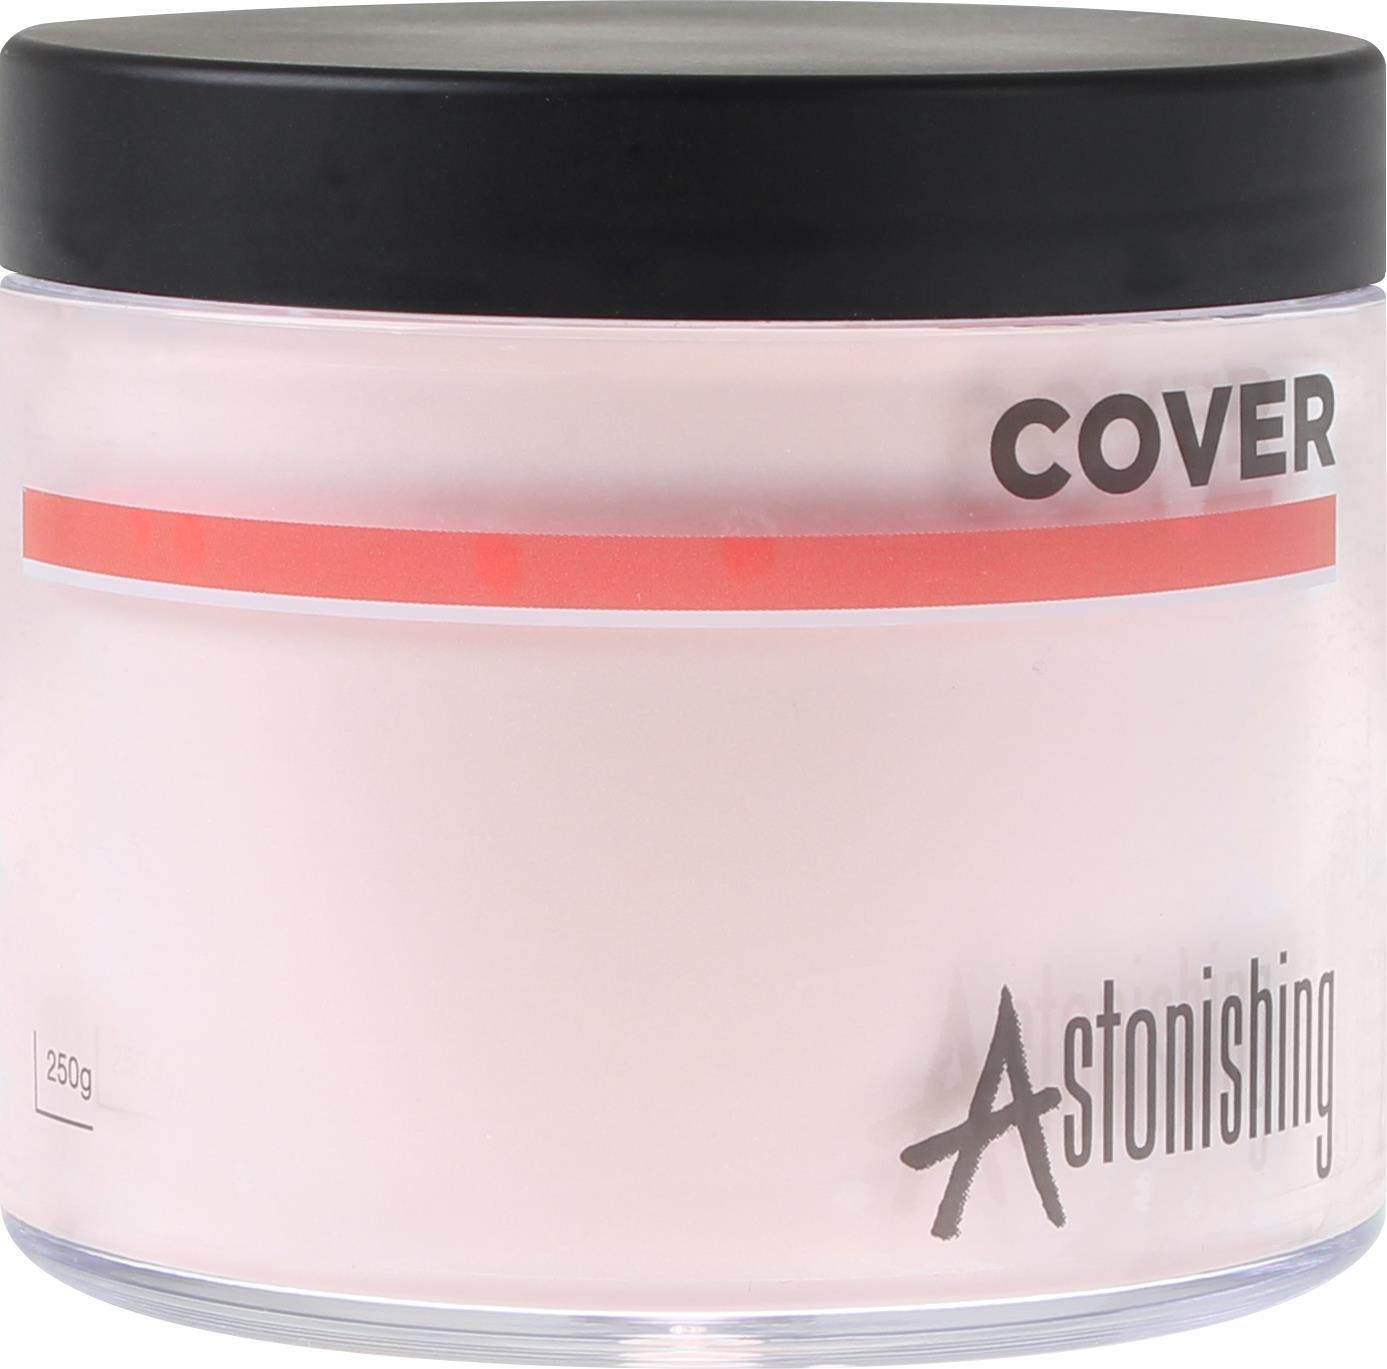 Afbeelding van AST - Acryl Powder Cover 250gr